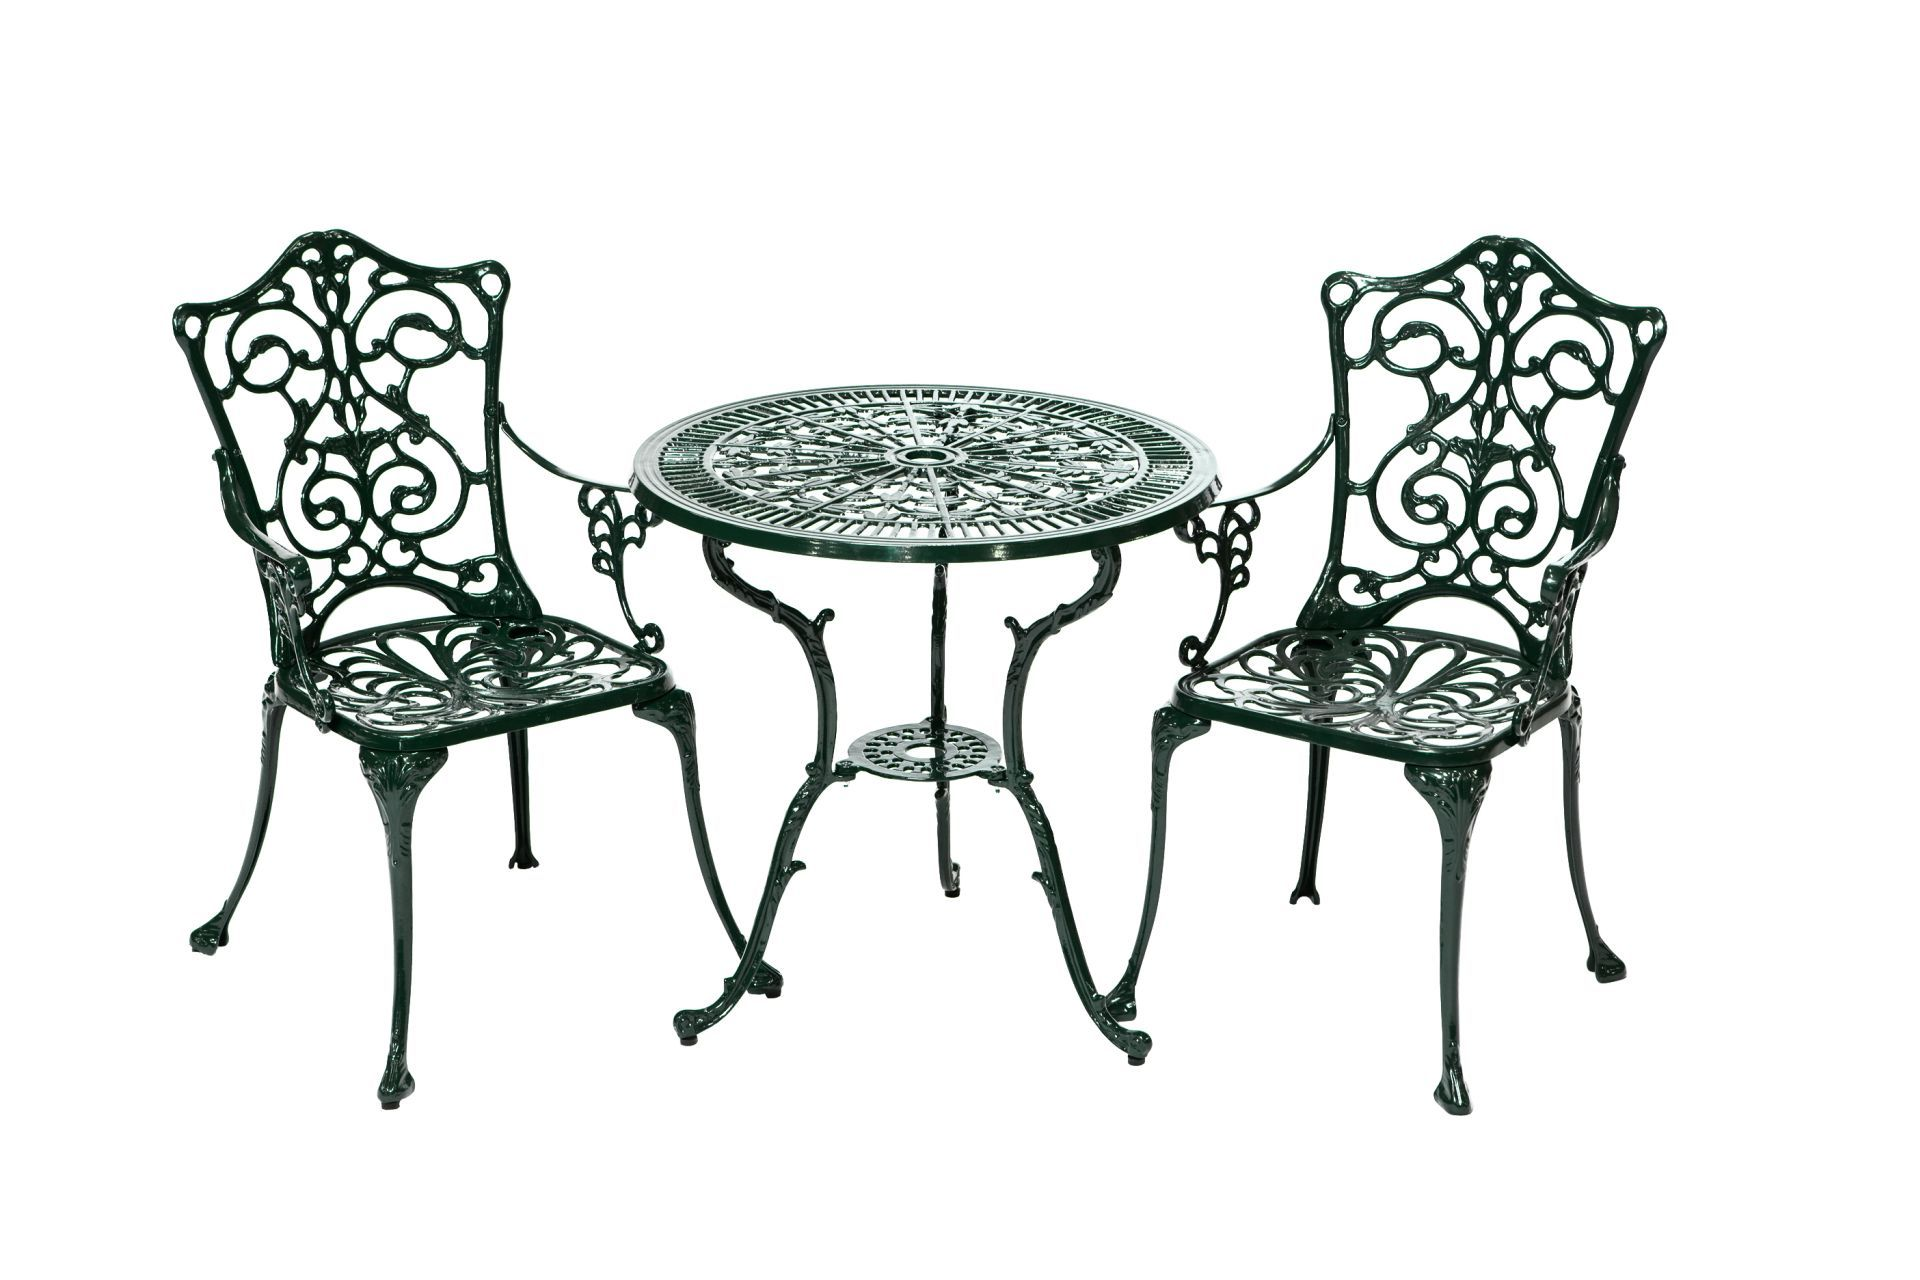 Gartenmobel Metall Rostfrei Dekoration